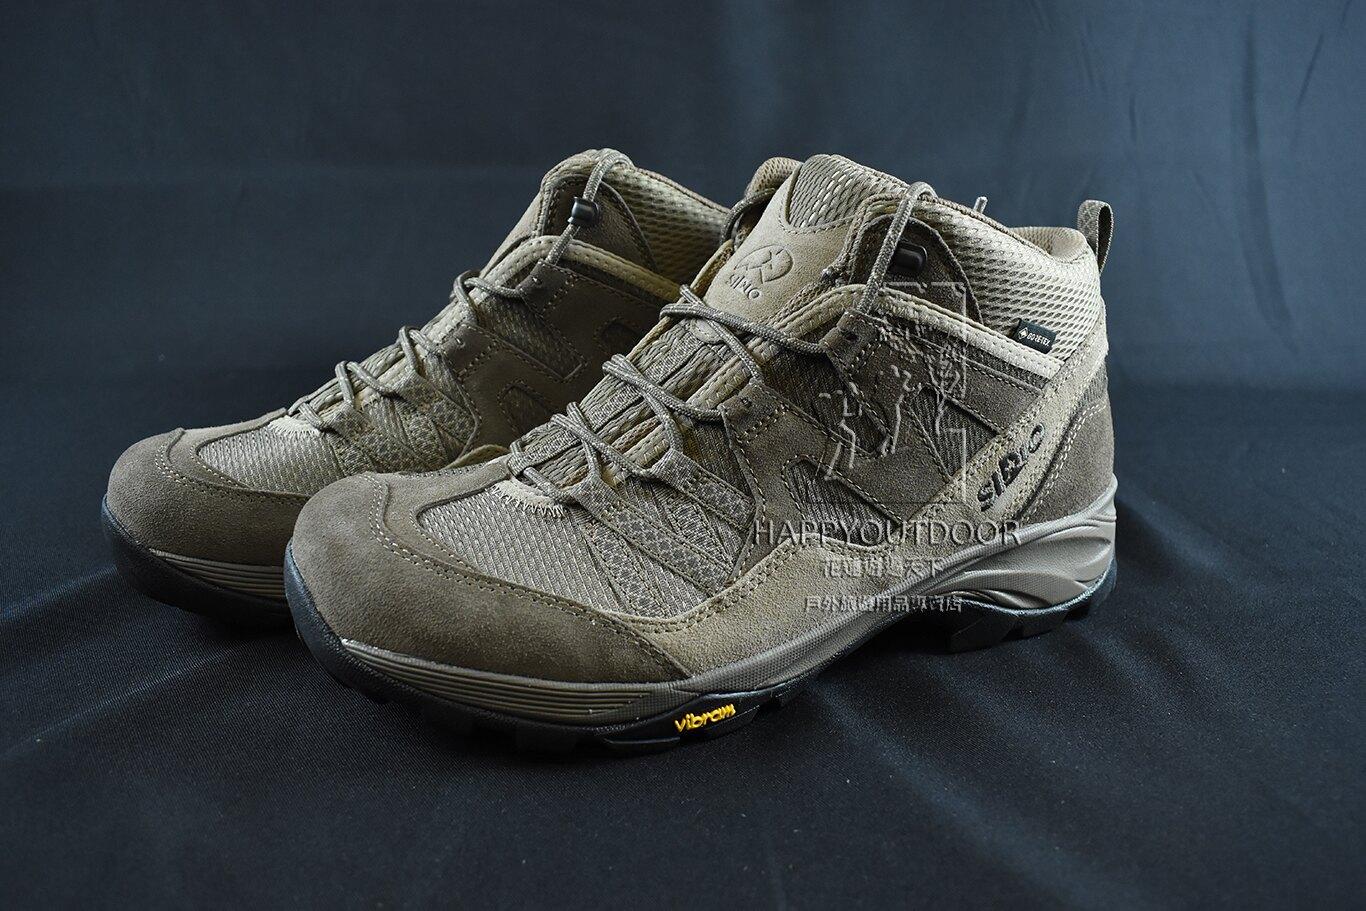 SIRIO PF156BE Gore-Tex 防水中筒登山鞋 休閒鞋 健行鞋  男款 棕色 PF156-2 BE SS214\t【Happy Outdoor 花蓮遊遍天下】